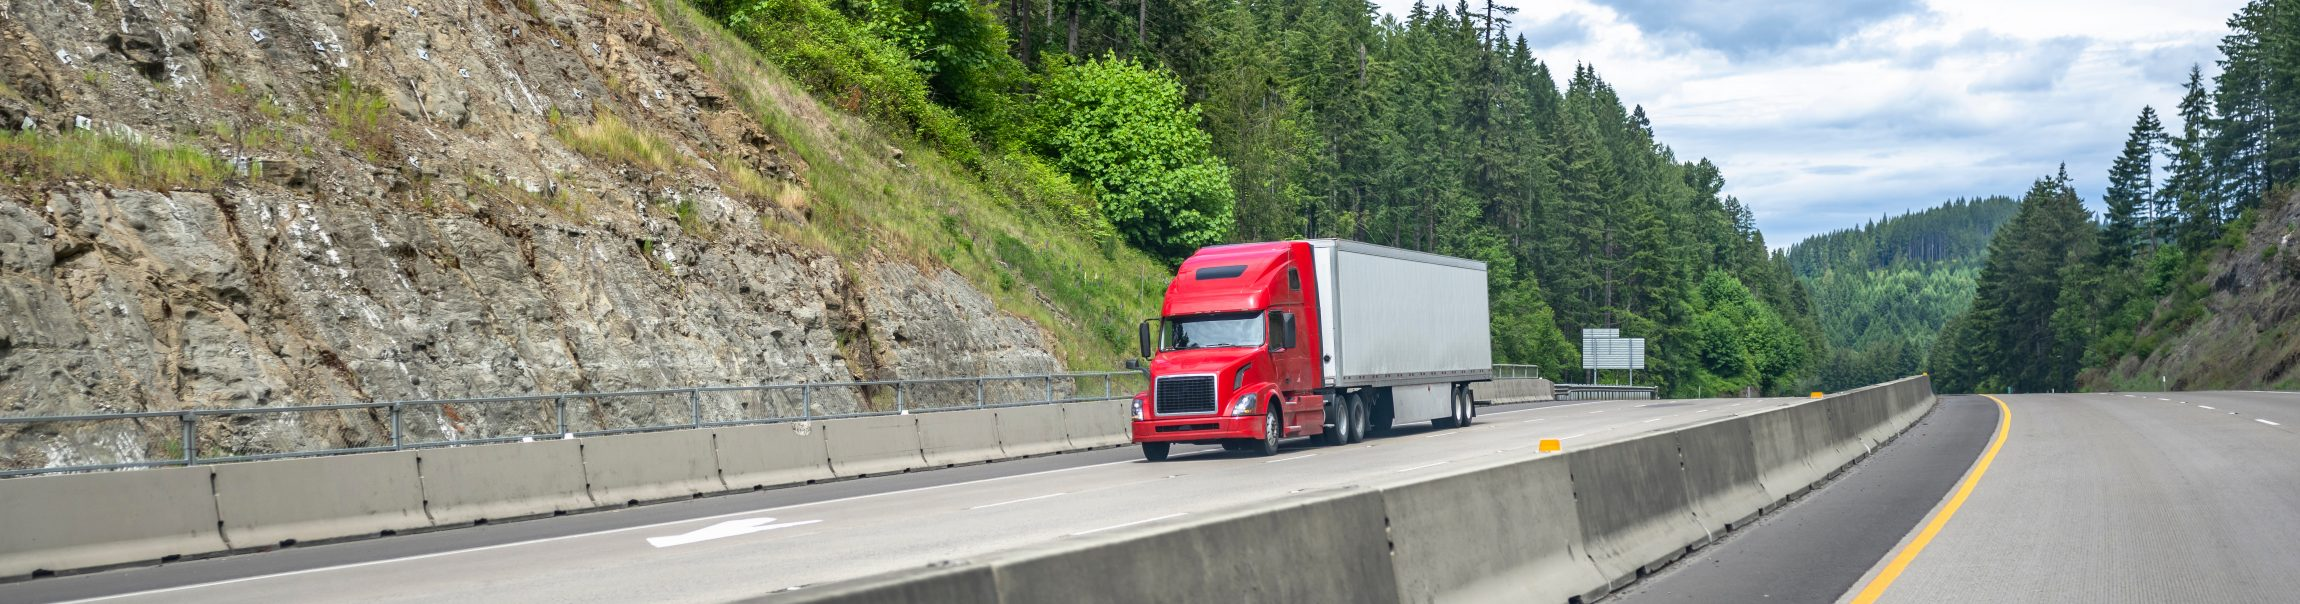 long haul industrial semi truck